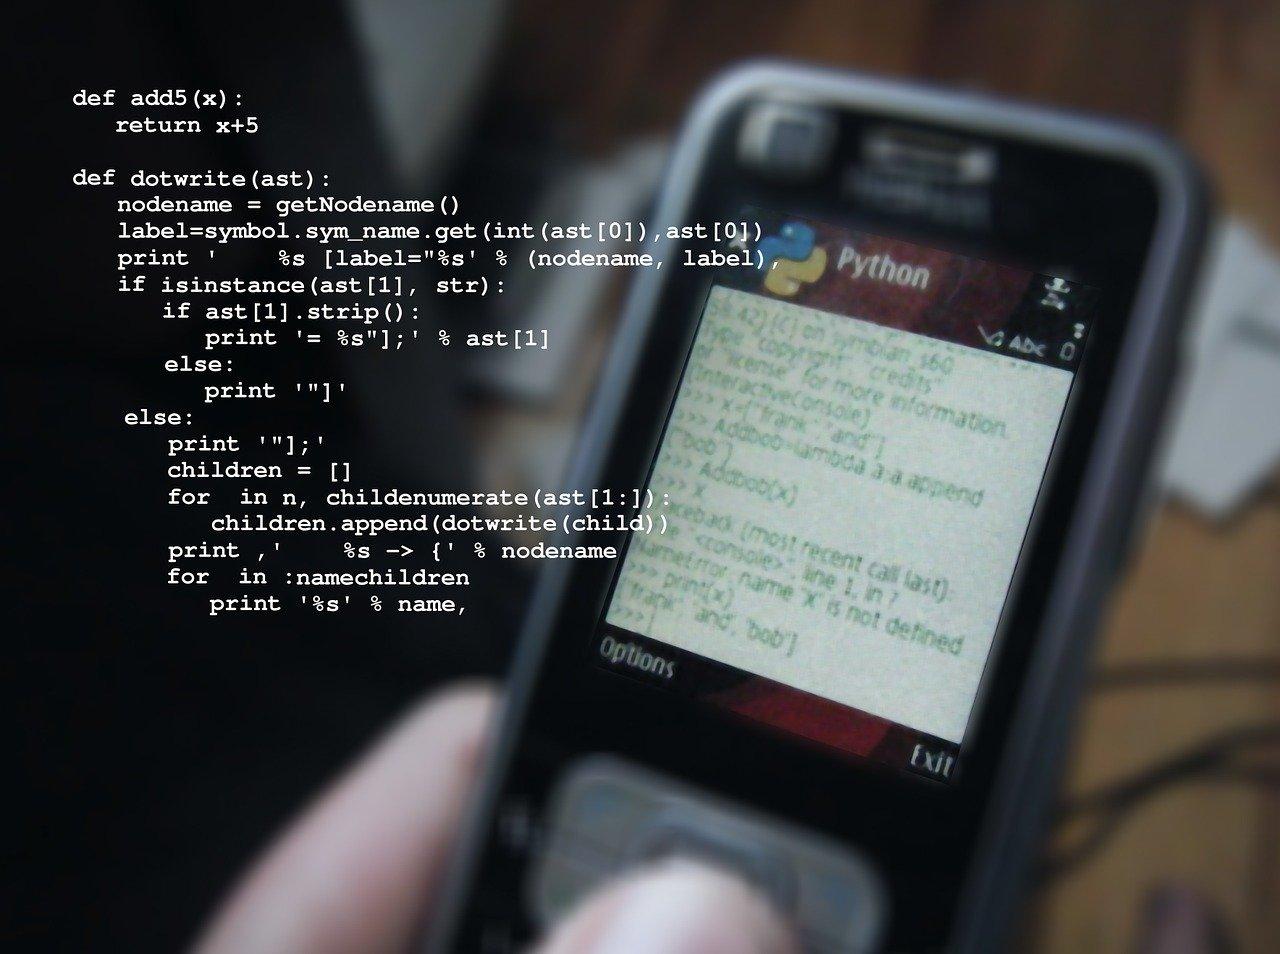 mobile phone, python, programming language